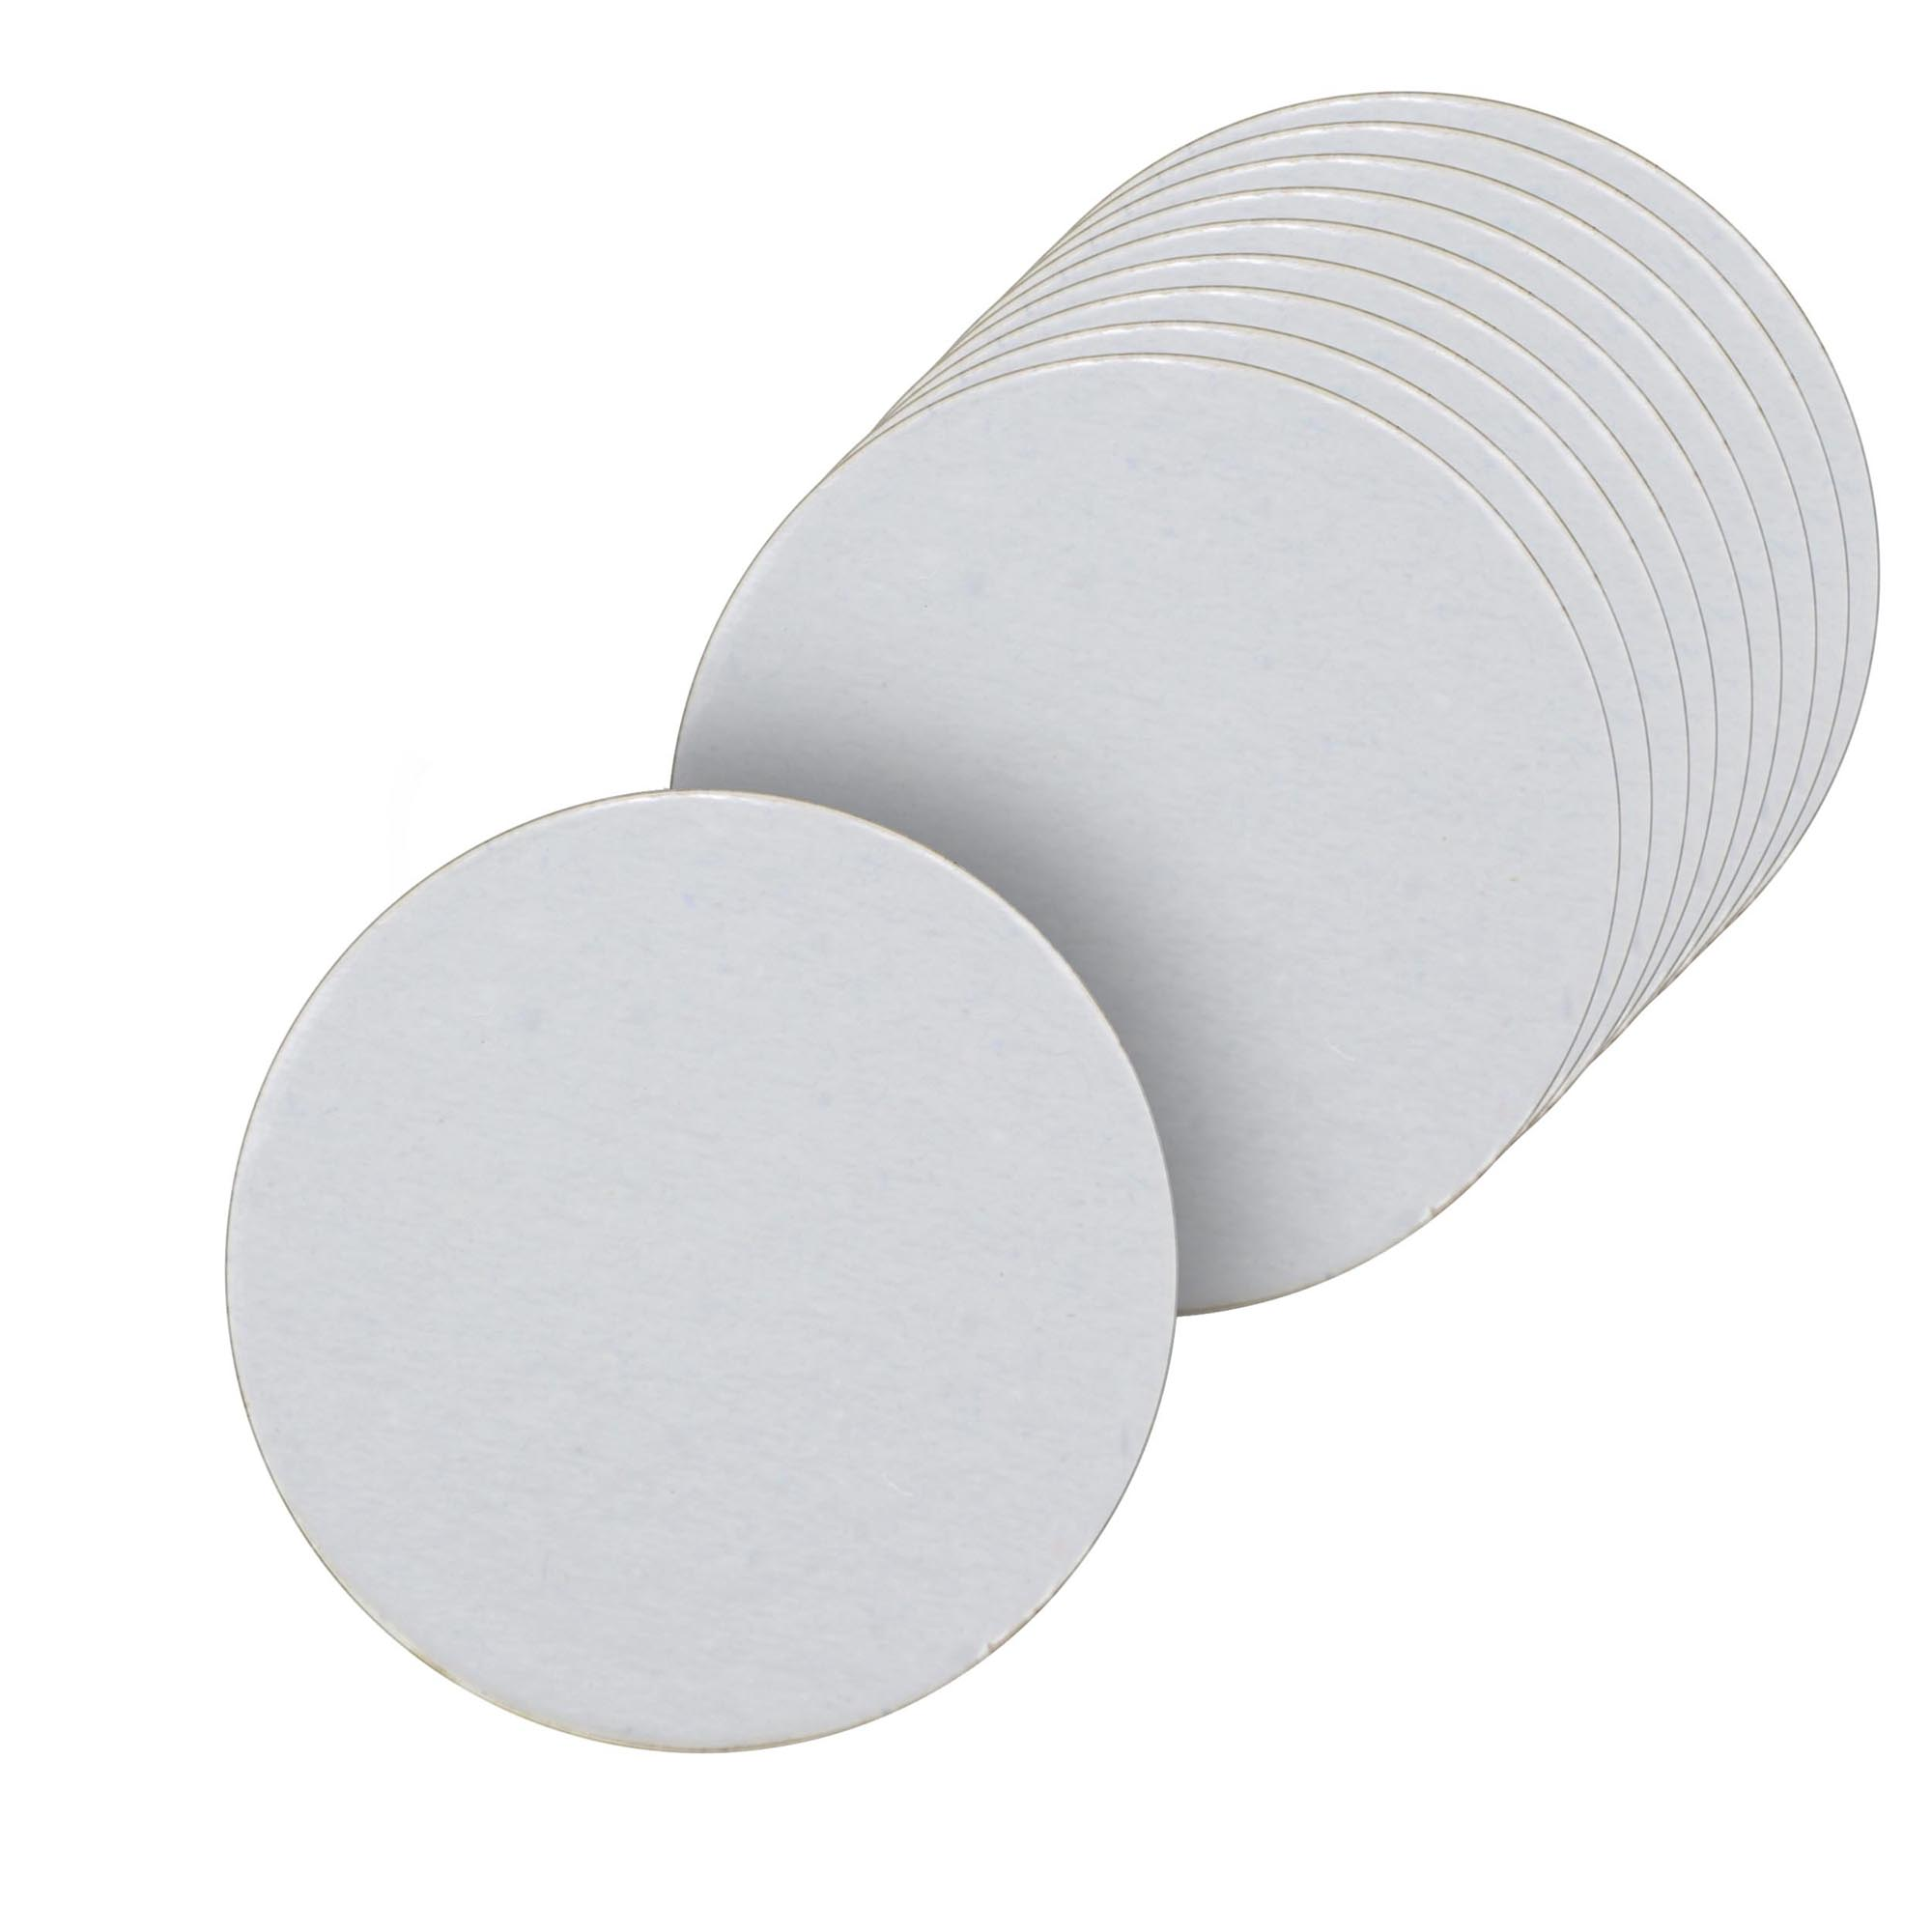 100 Bases Laminadas, Suporte P/ Doces, Disco 10cm - Branca